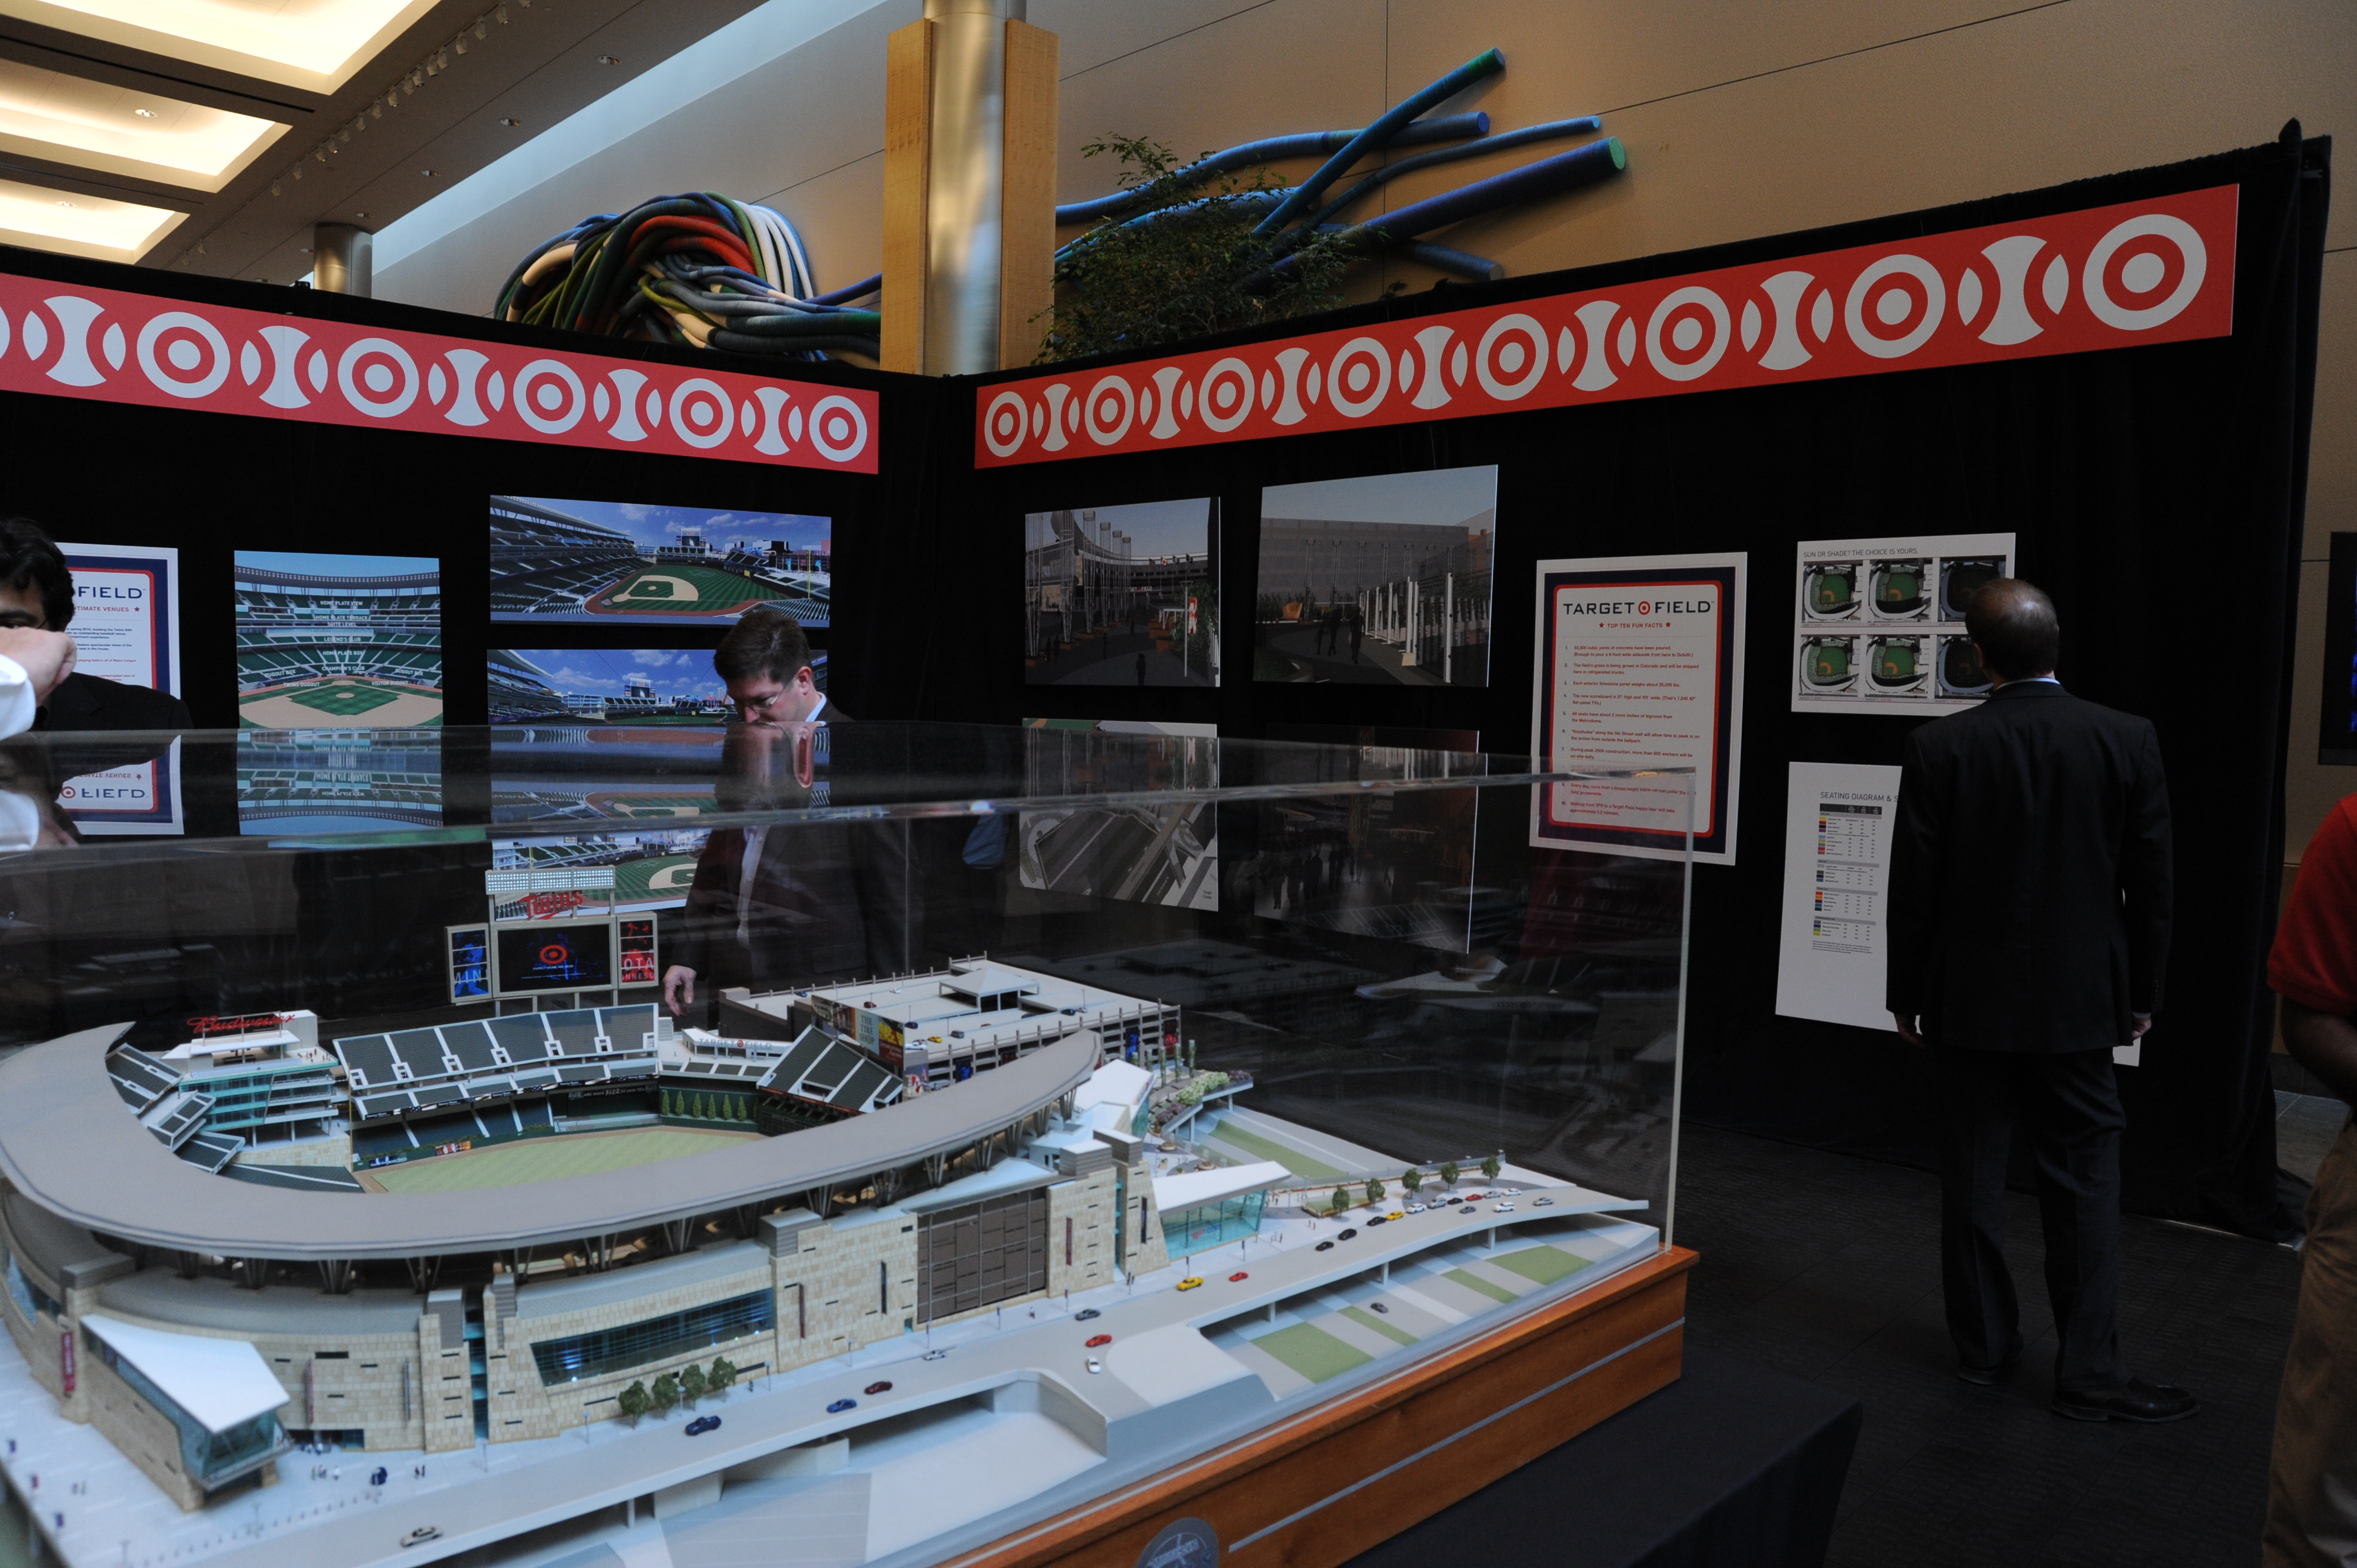 Target Field: Stadium Presentation